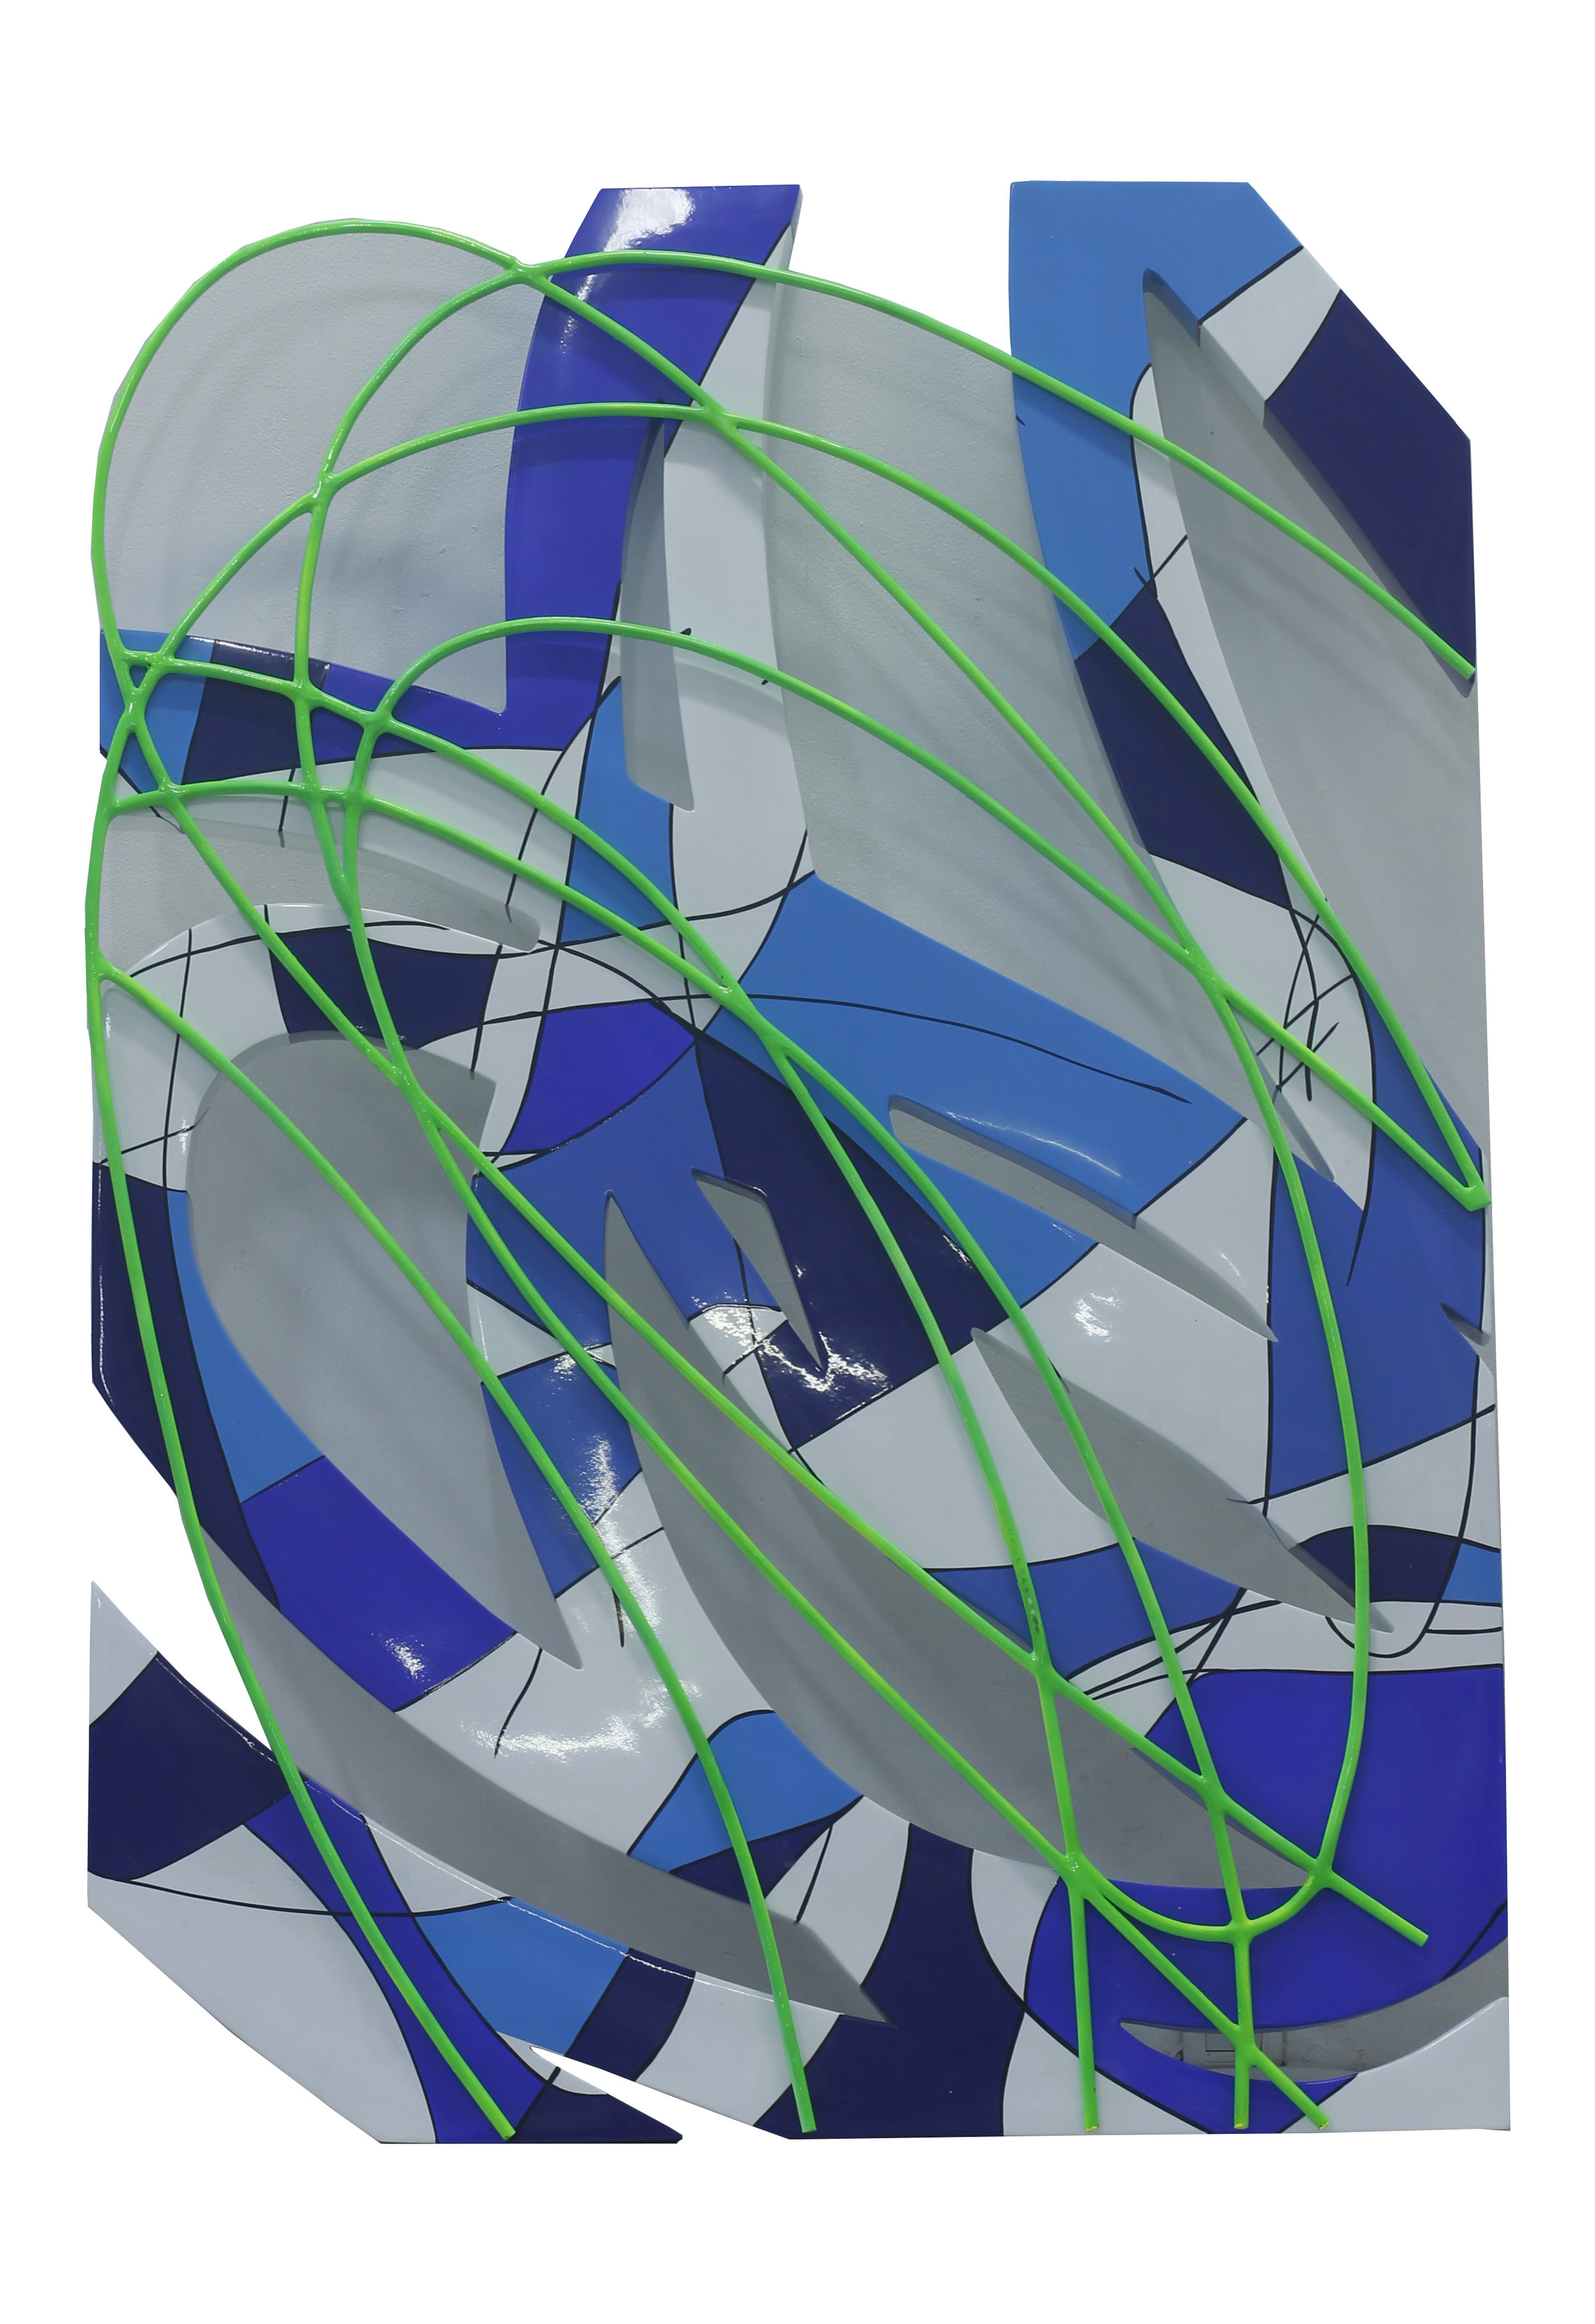 Artist: Erwin Windu Pranata, Indonesia  Title: The Stroke #3 Medium: polyurethane paint on steel sheet Dimension: 100 X 140 X 6 cm Year: 2019